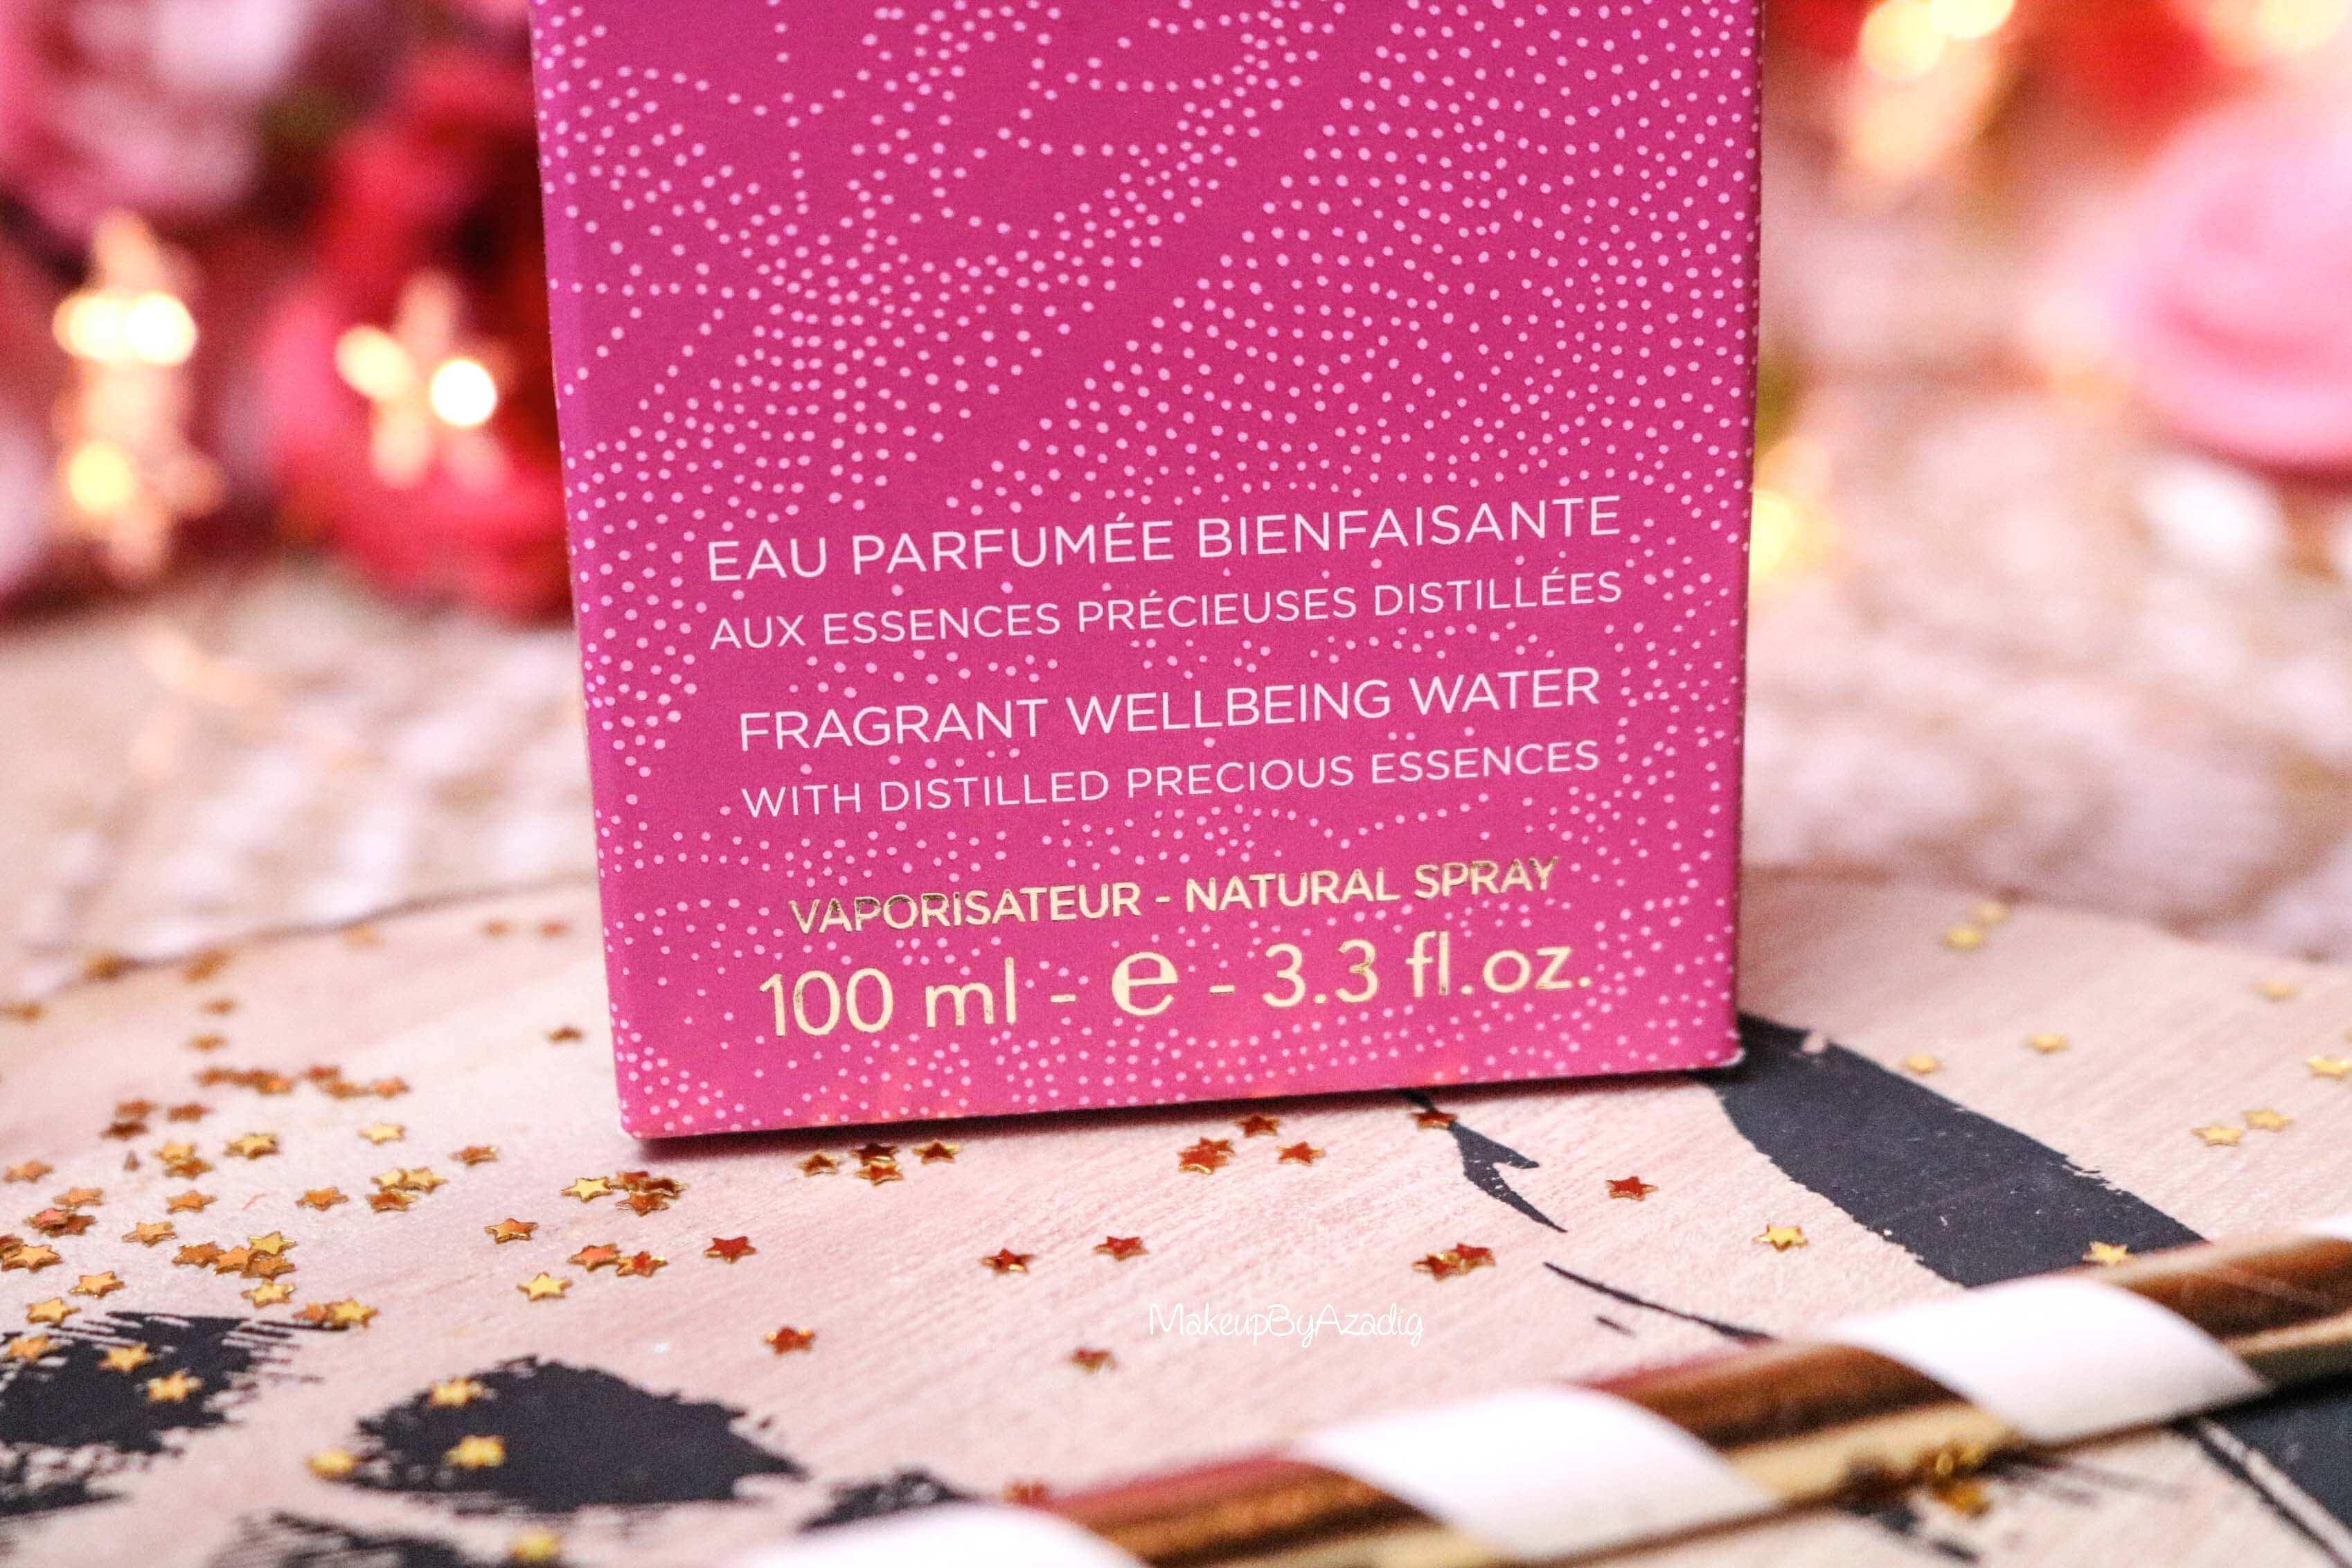 revue-eau-parfumee-bienfaisante-rose-imaginaire-roger-gallet-makeupbyazadig-parfum-bonne-tenue-avis-prix-monoprix-100ml